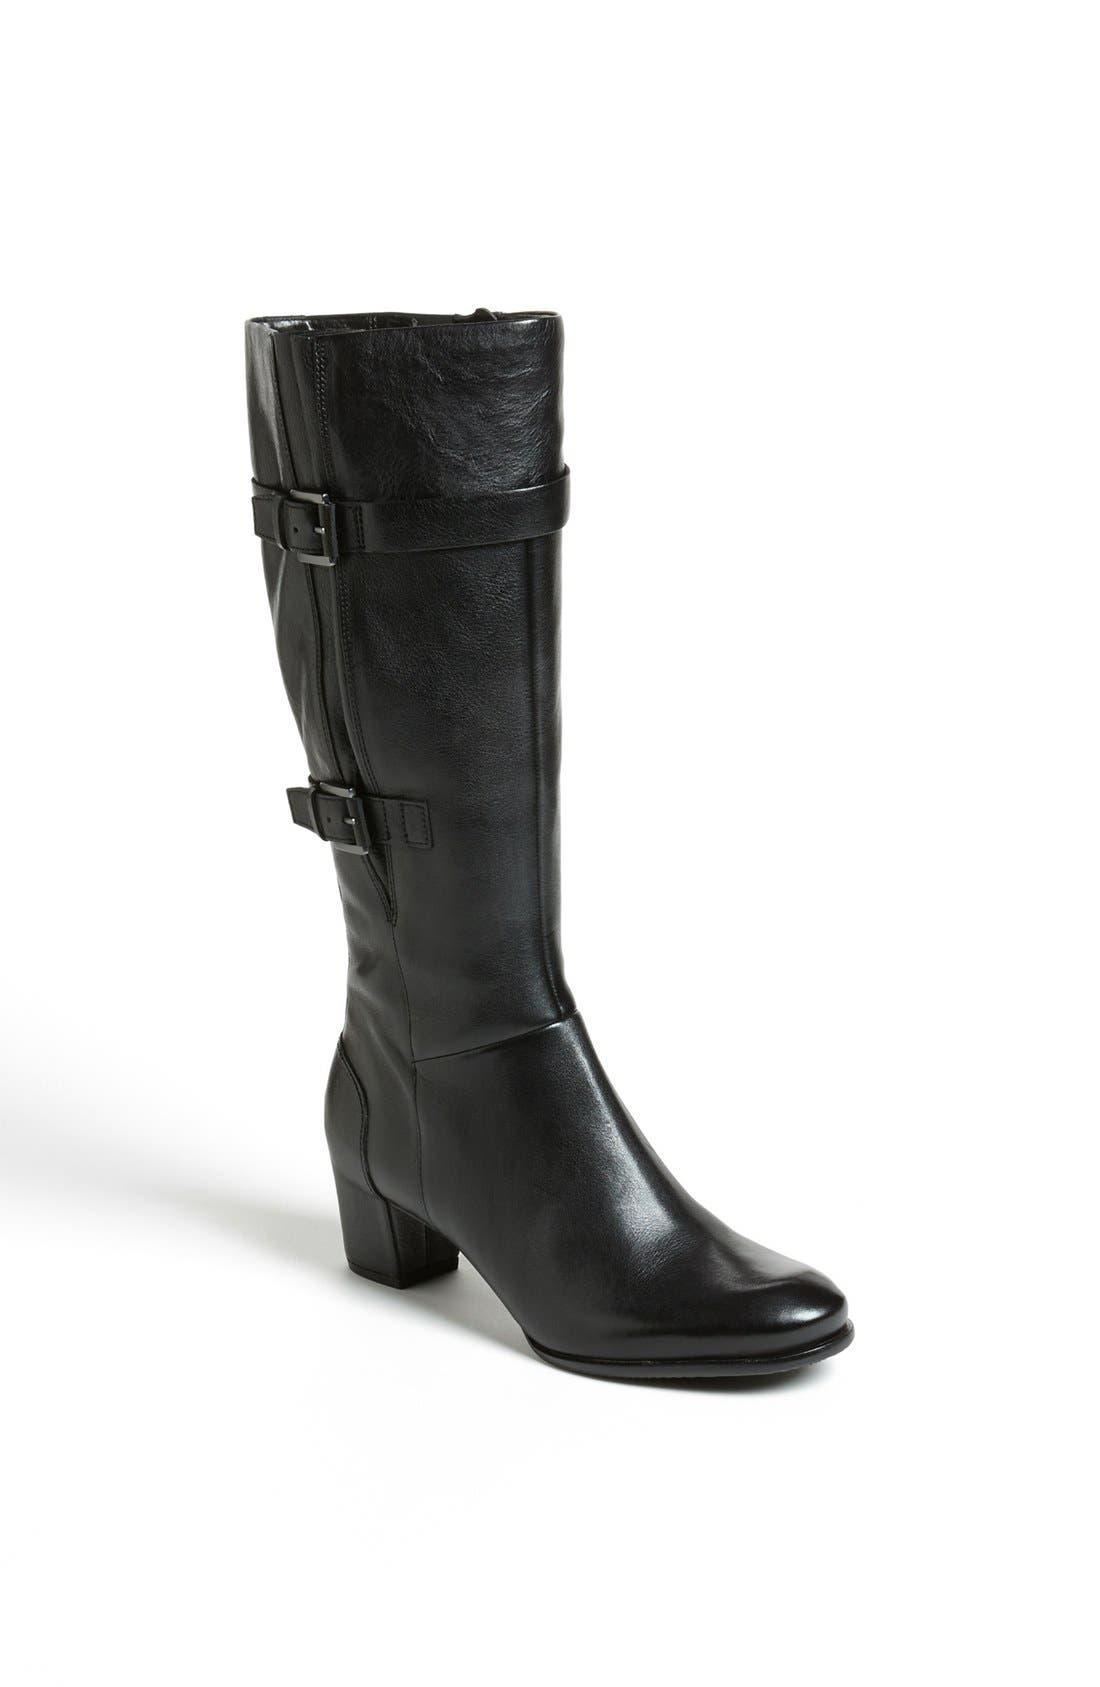 Main Image - ECCO 'Pailin' Boot (Wide Calf)